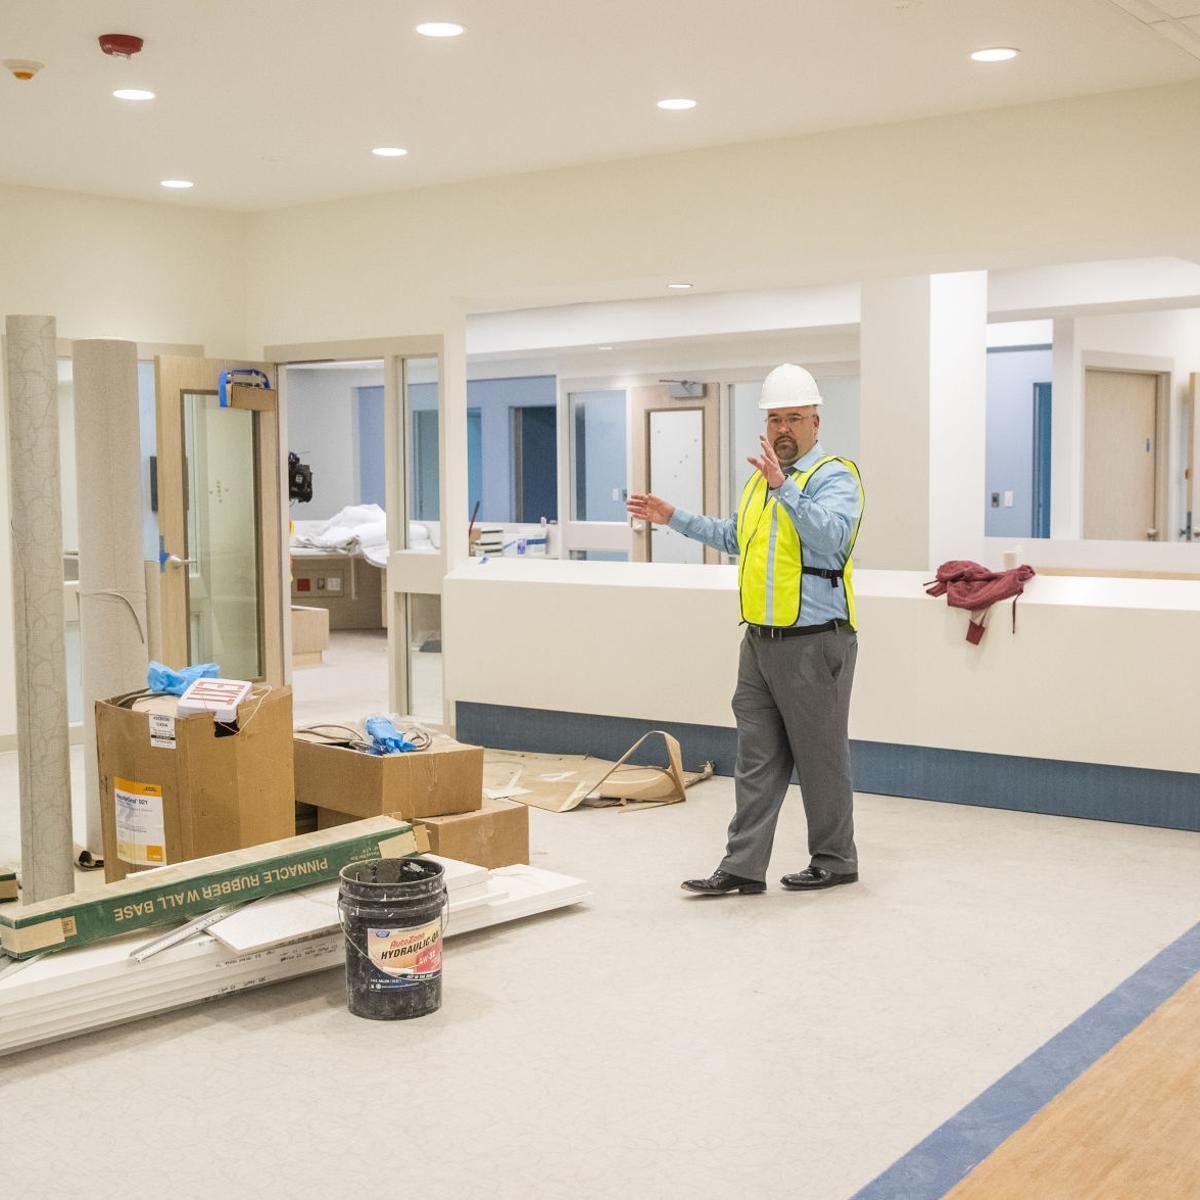 A Look Inside The Progress At Children S Hospital Expanded Mental Health Facility Health Care Hospitals Nola Com